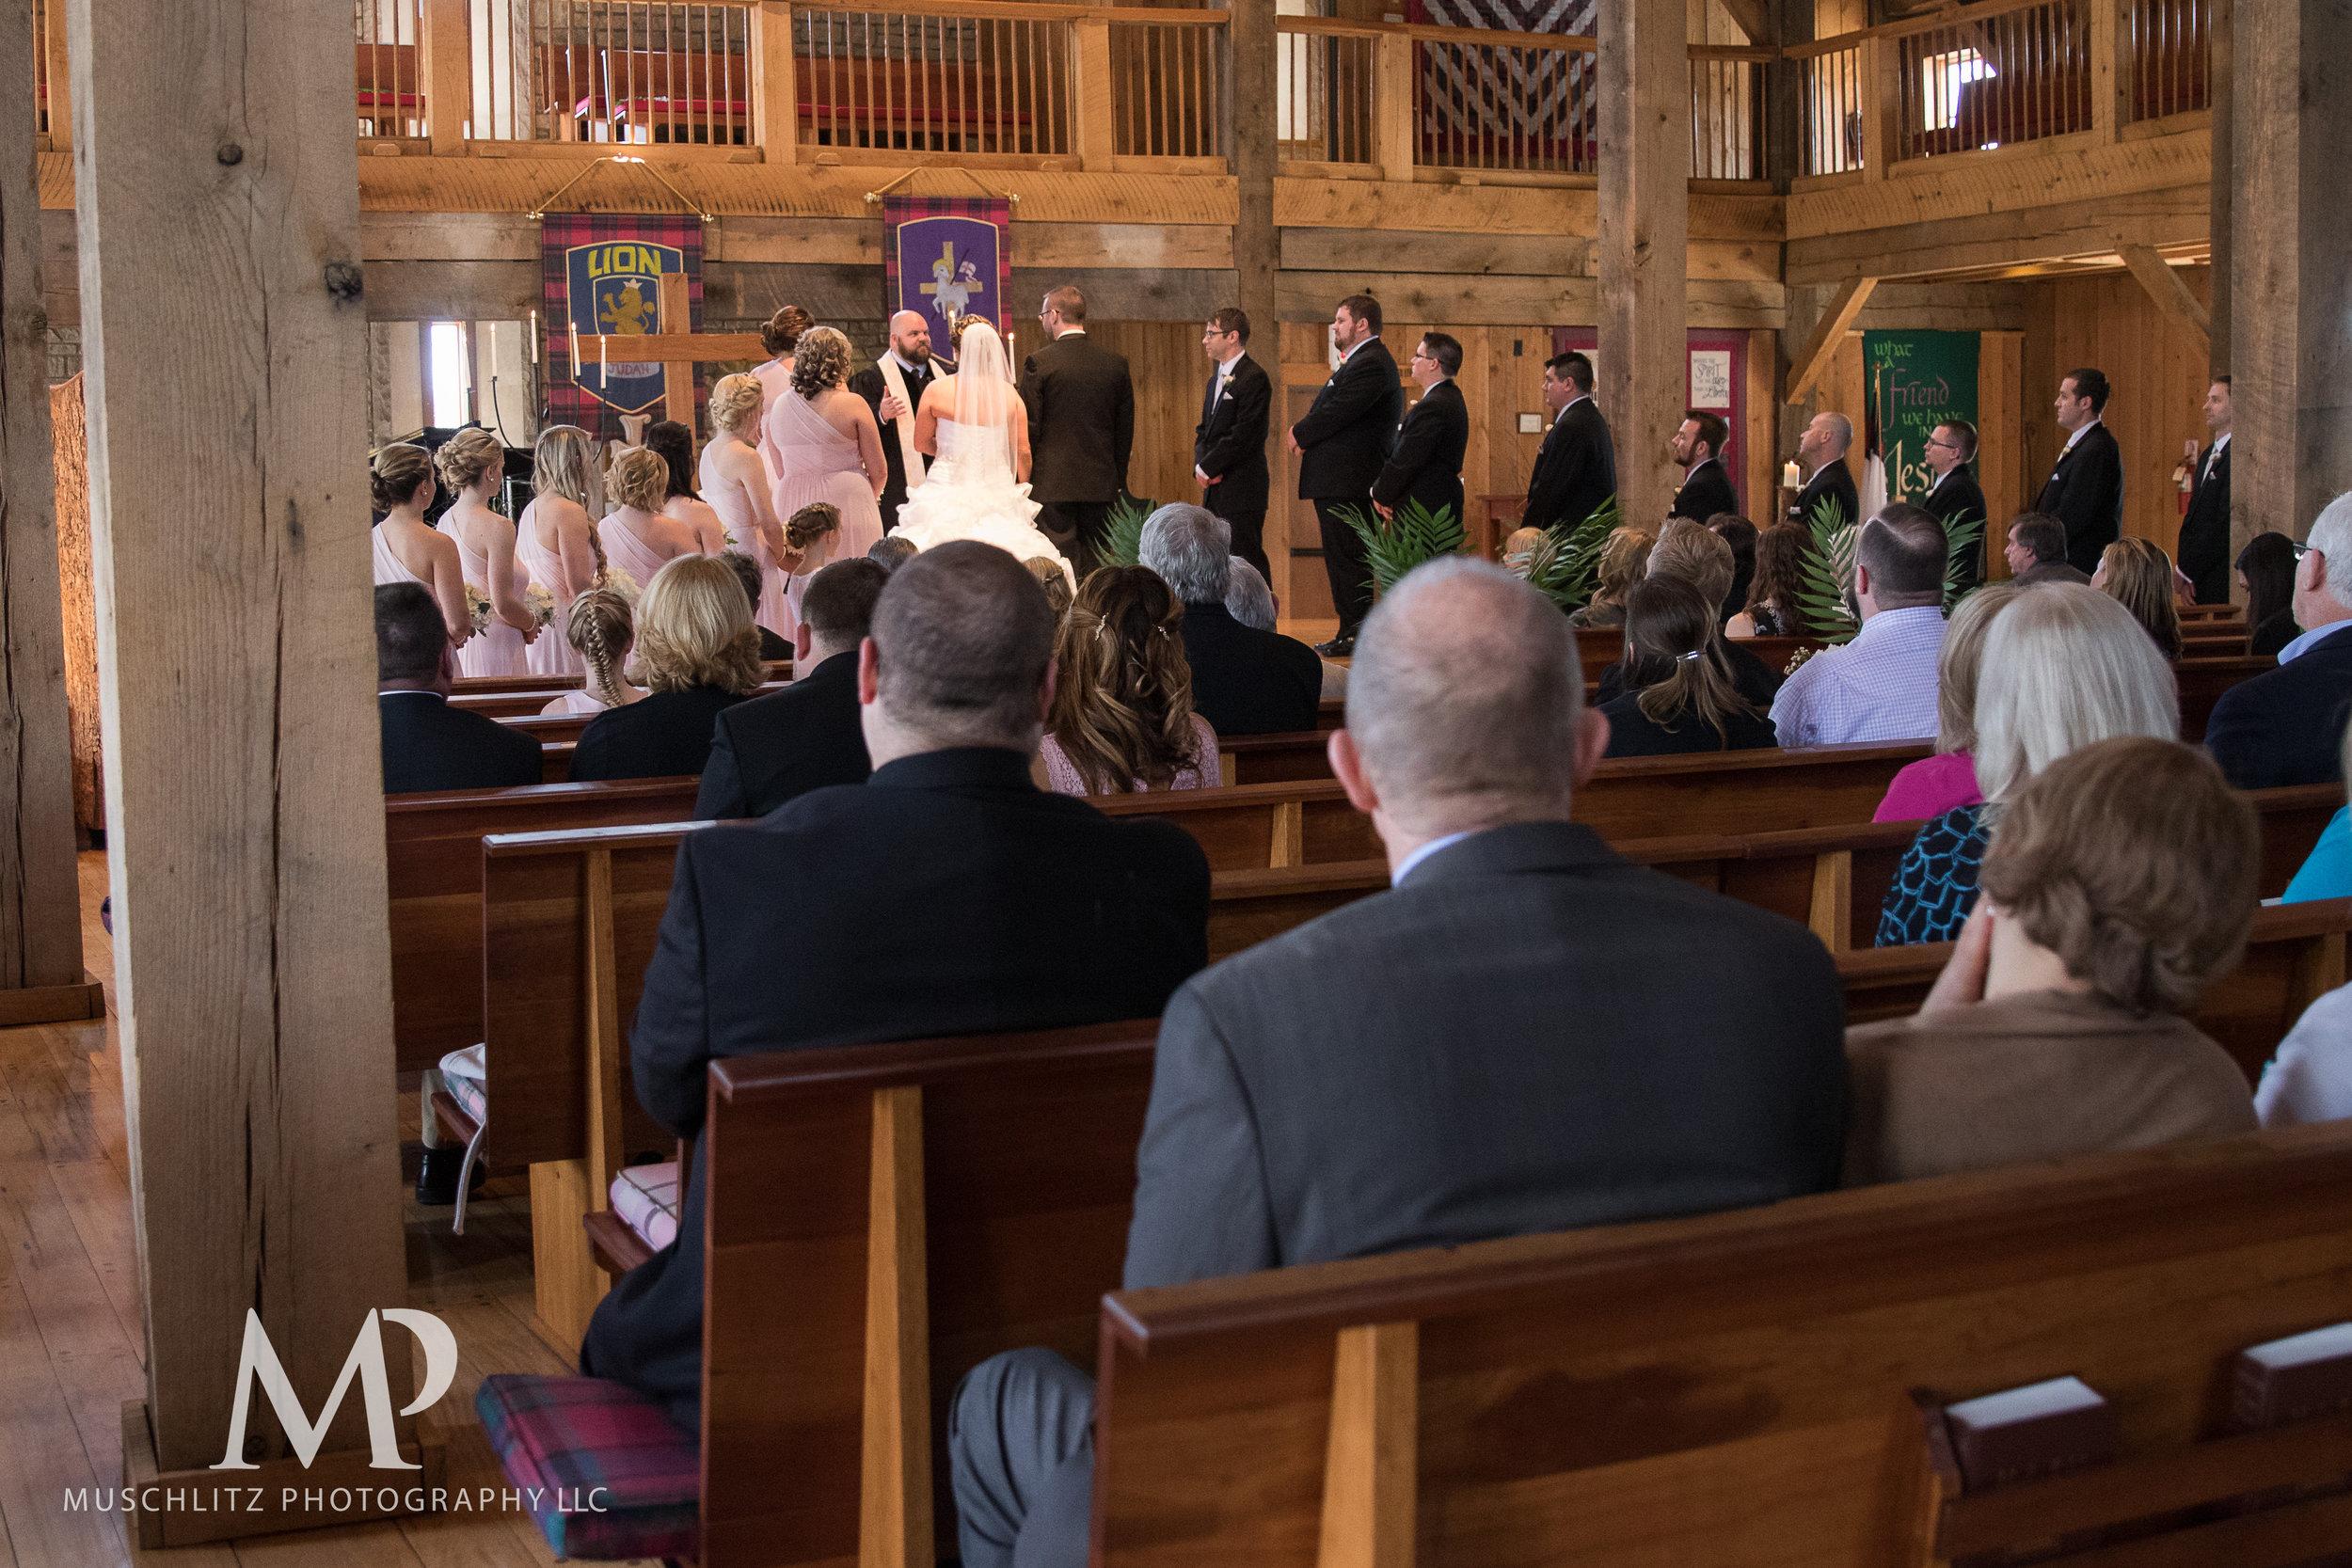 liberty-barn-presbyterian-church-wedding-delaware-columbus-ohio-muschlitz-photography-036.JPG